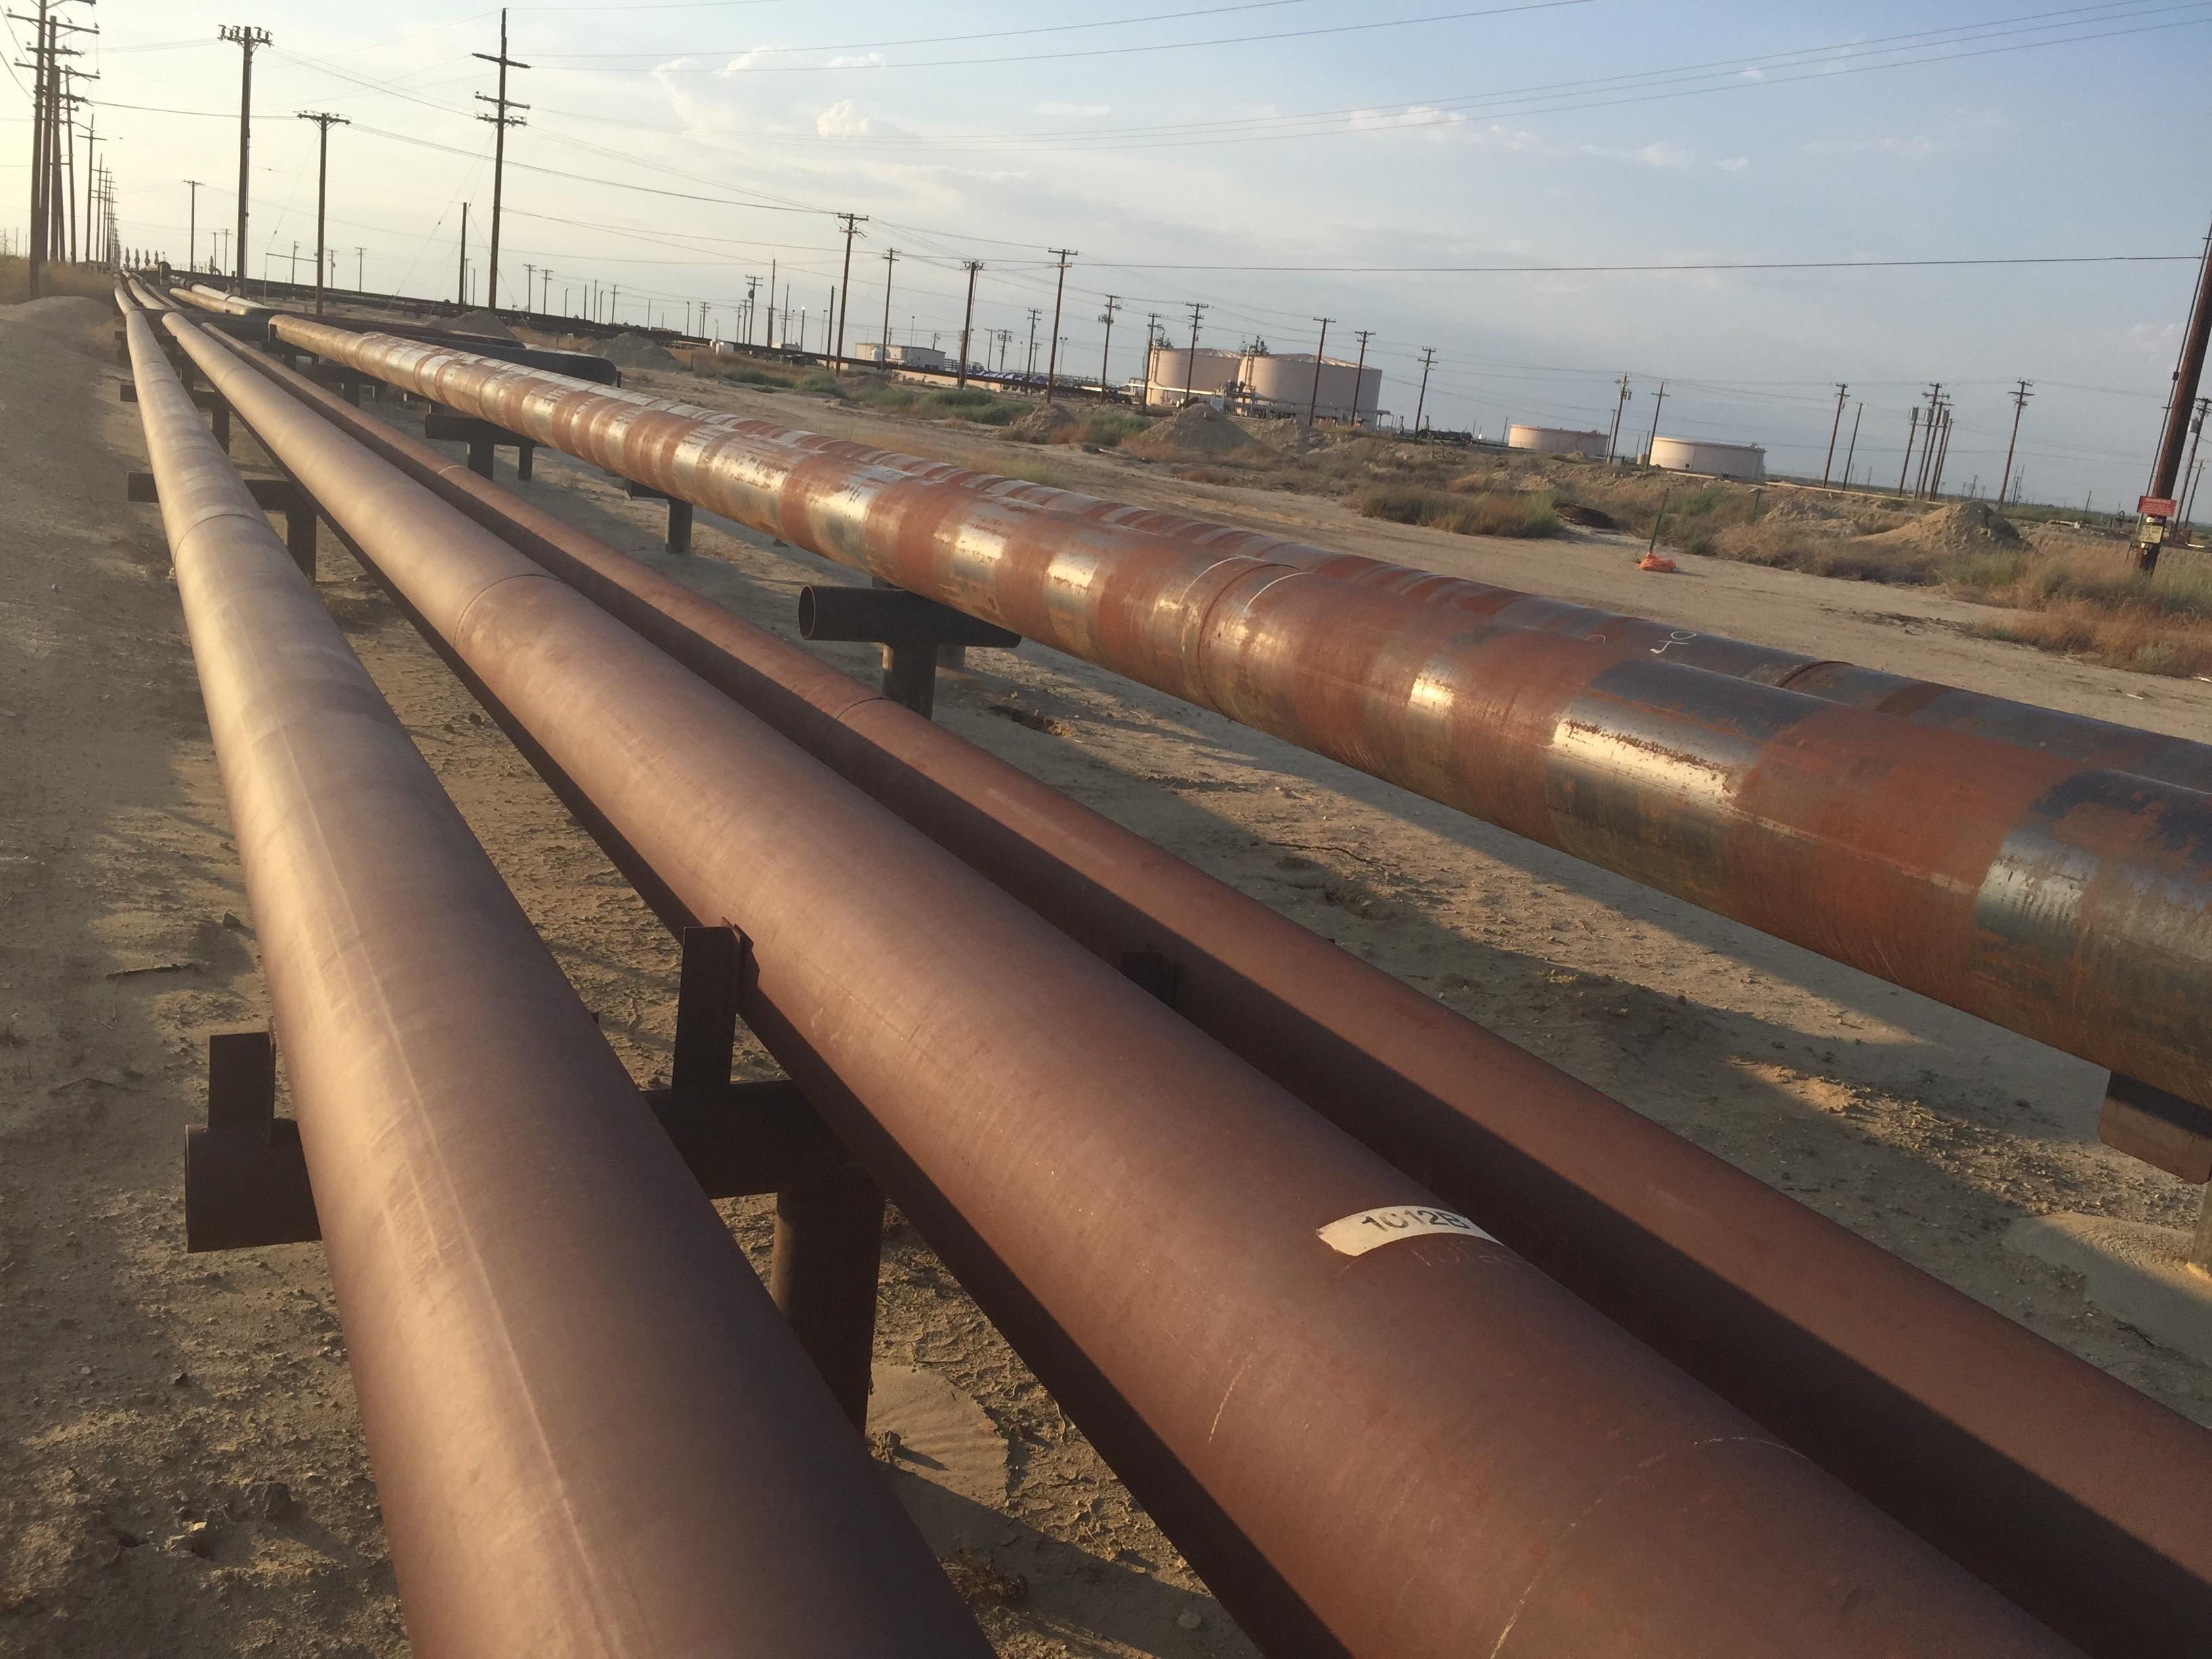 Pipelines, Belridge oil field. Credit Andrew Grinberg